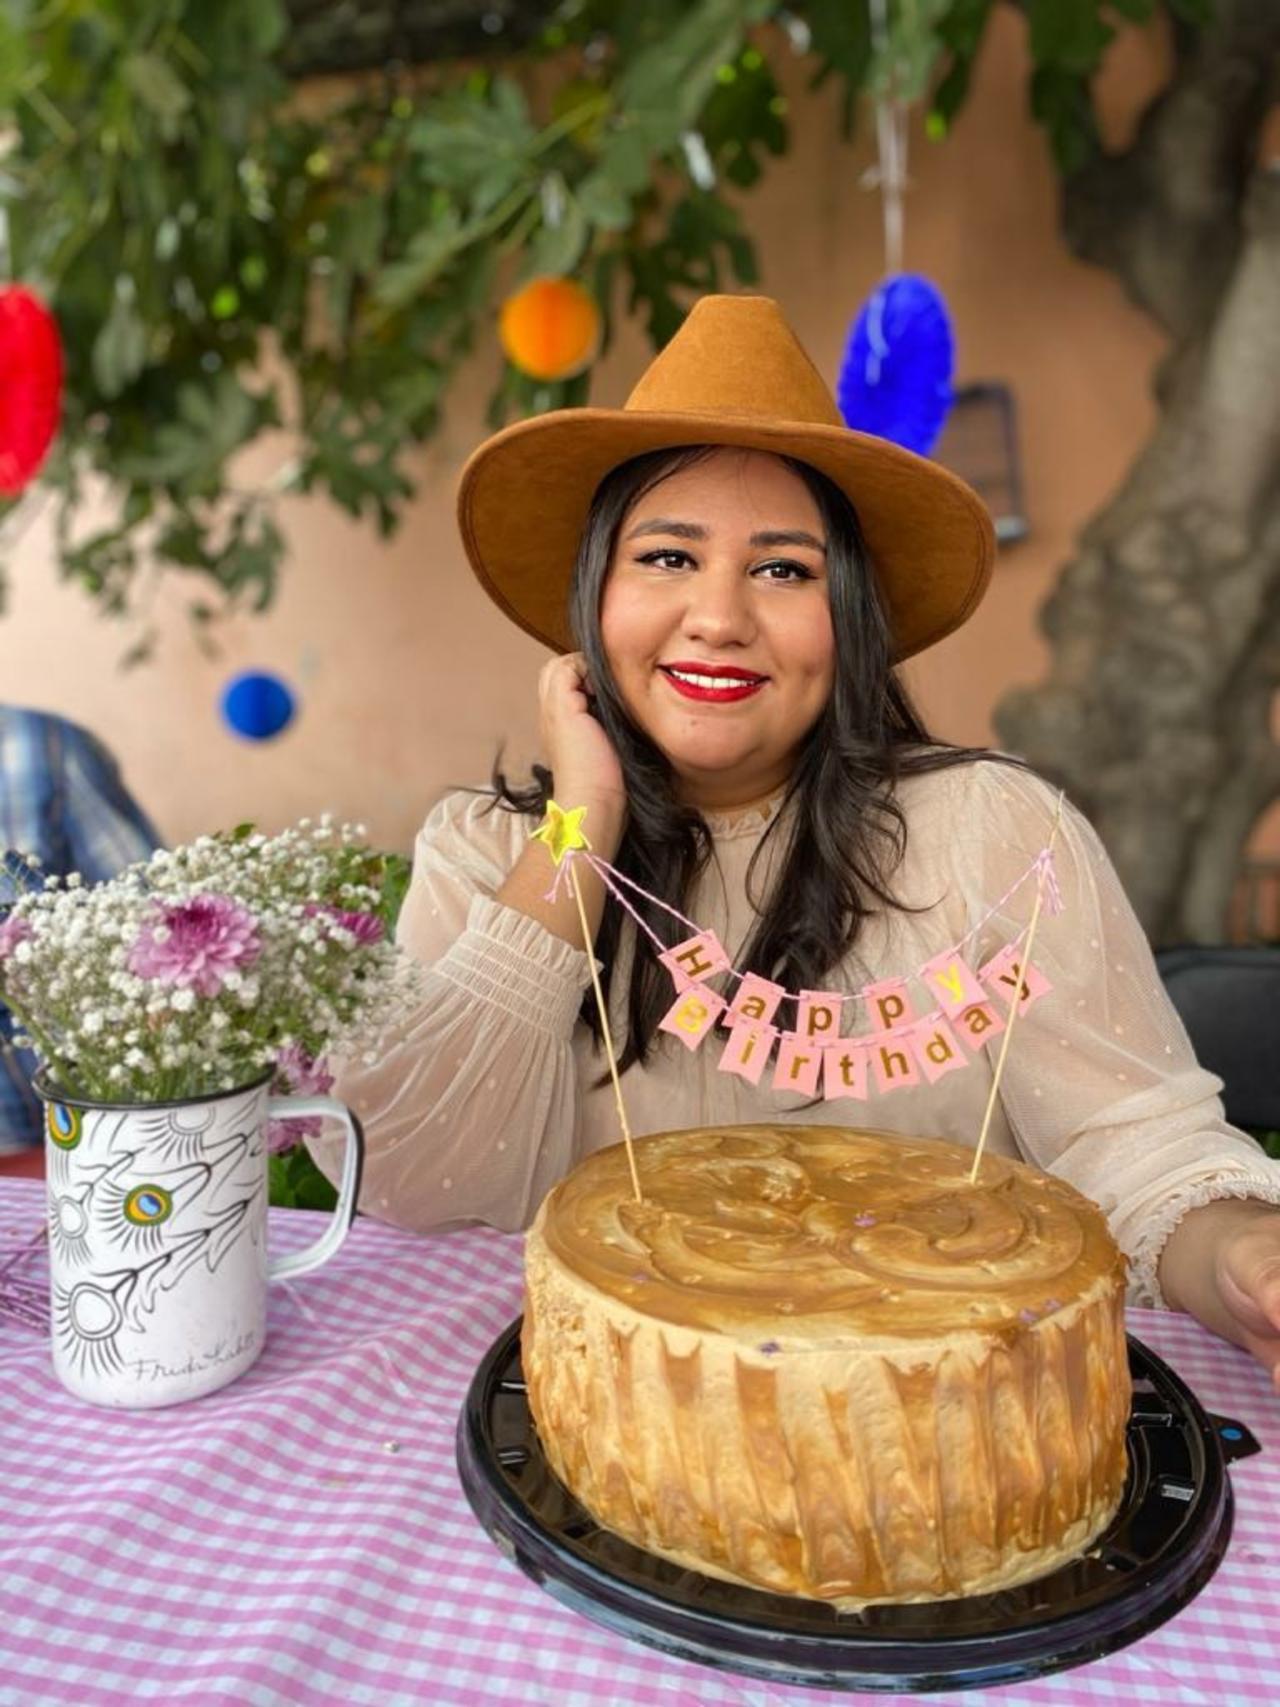 ¡Happy birthday Fabiola!